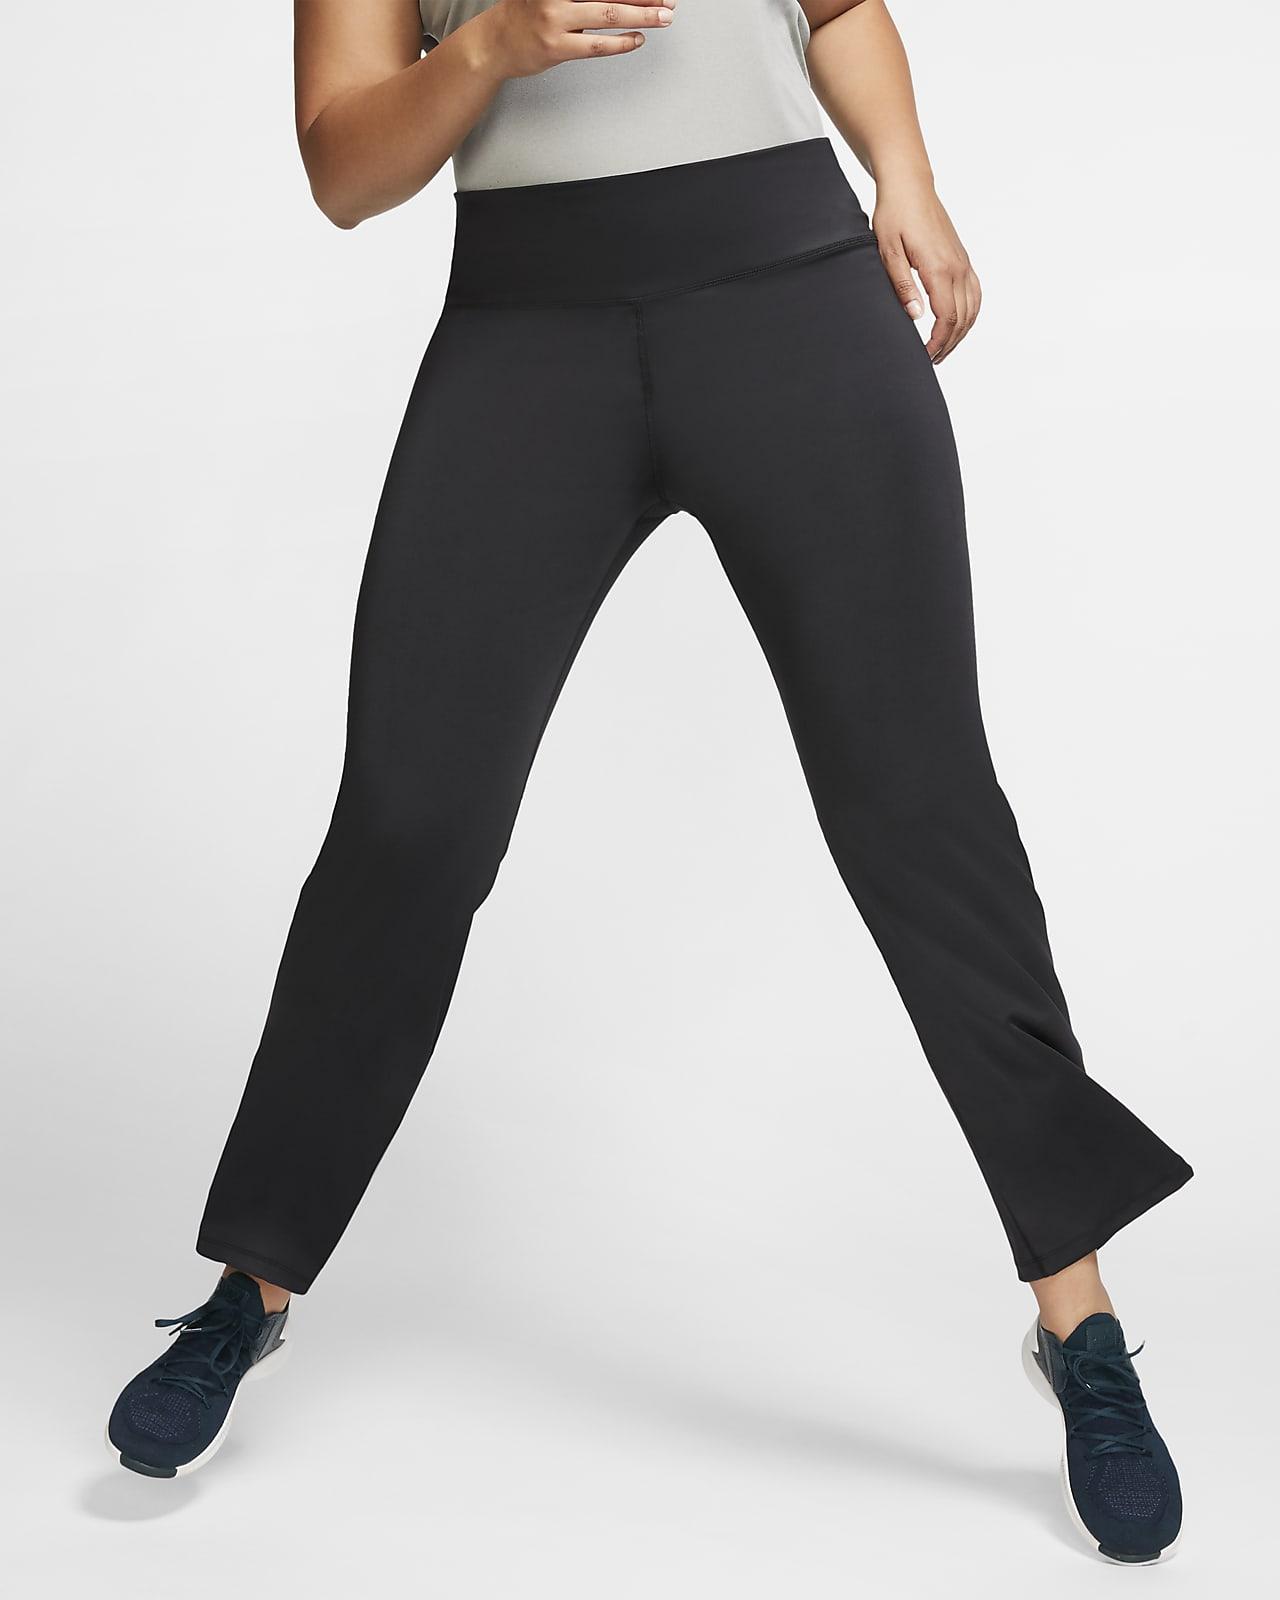 Nike Power Women's Training Trousers (Plus Size)